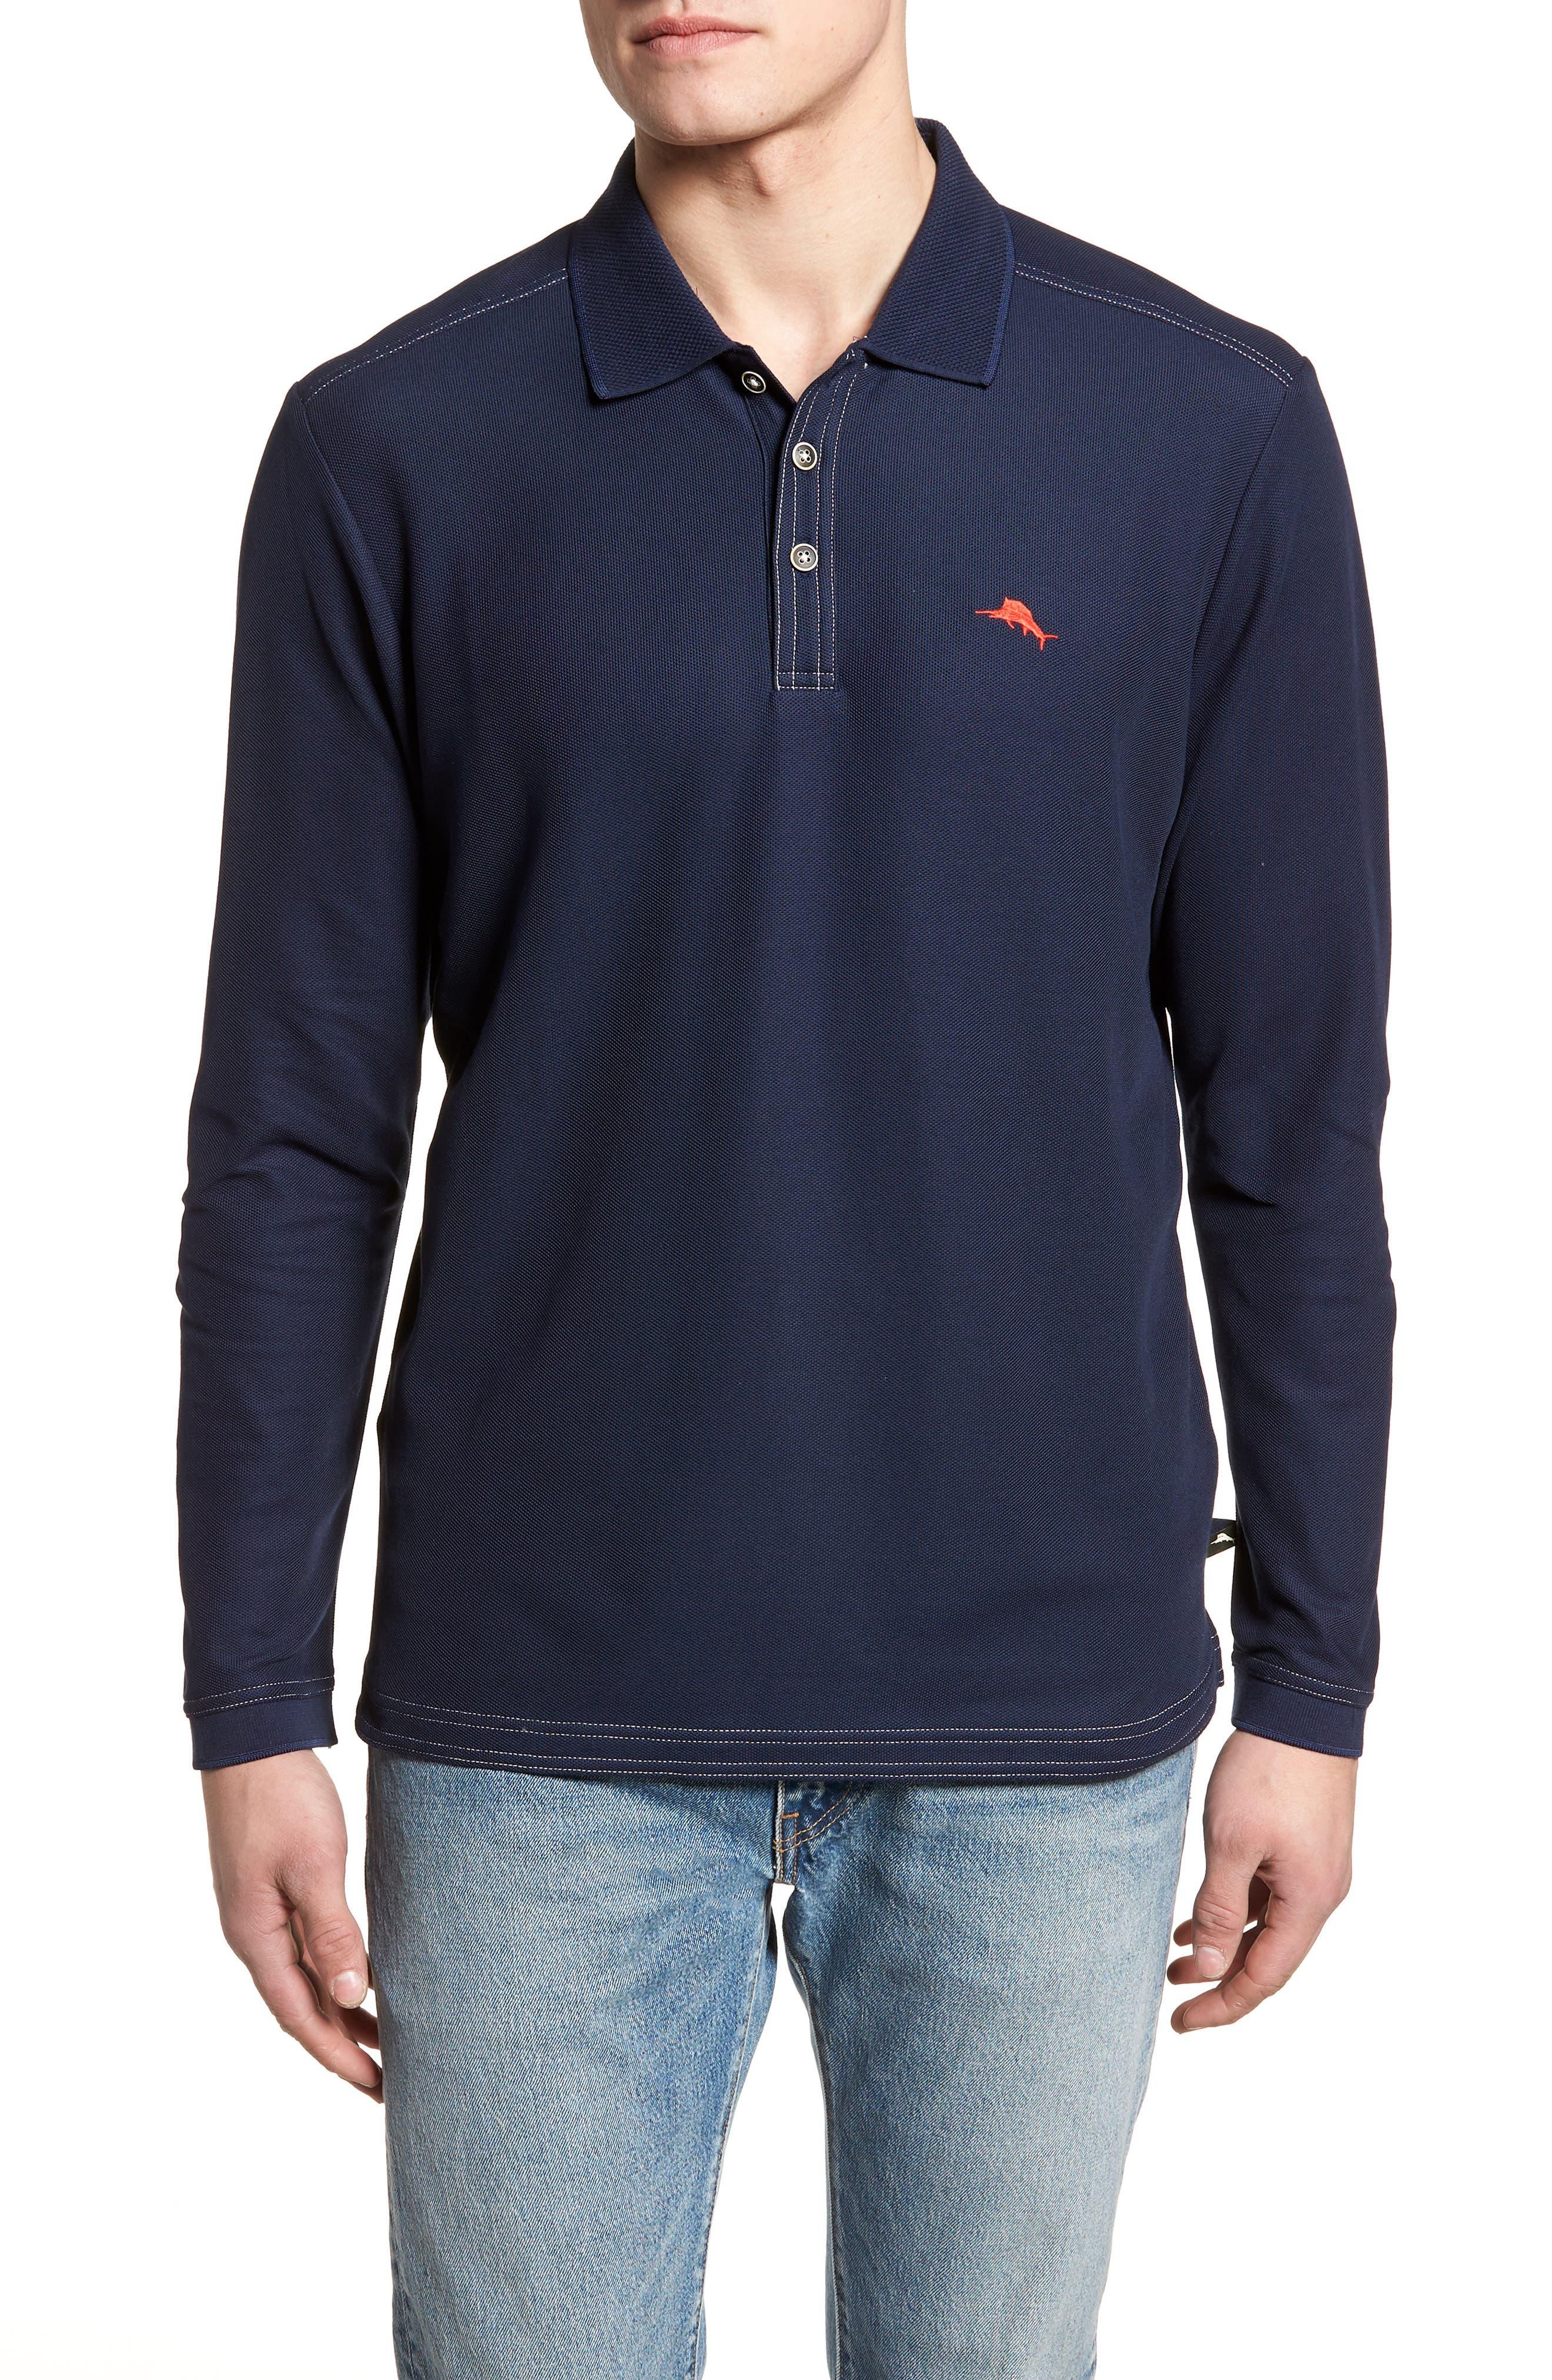 Emfielder Long Sleeve Polo,                             Main thumbnail 1, color,                             Blue Note